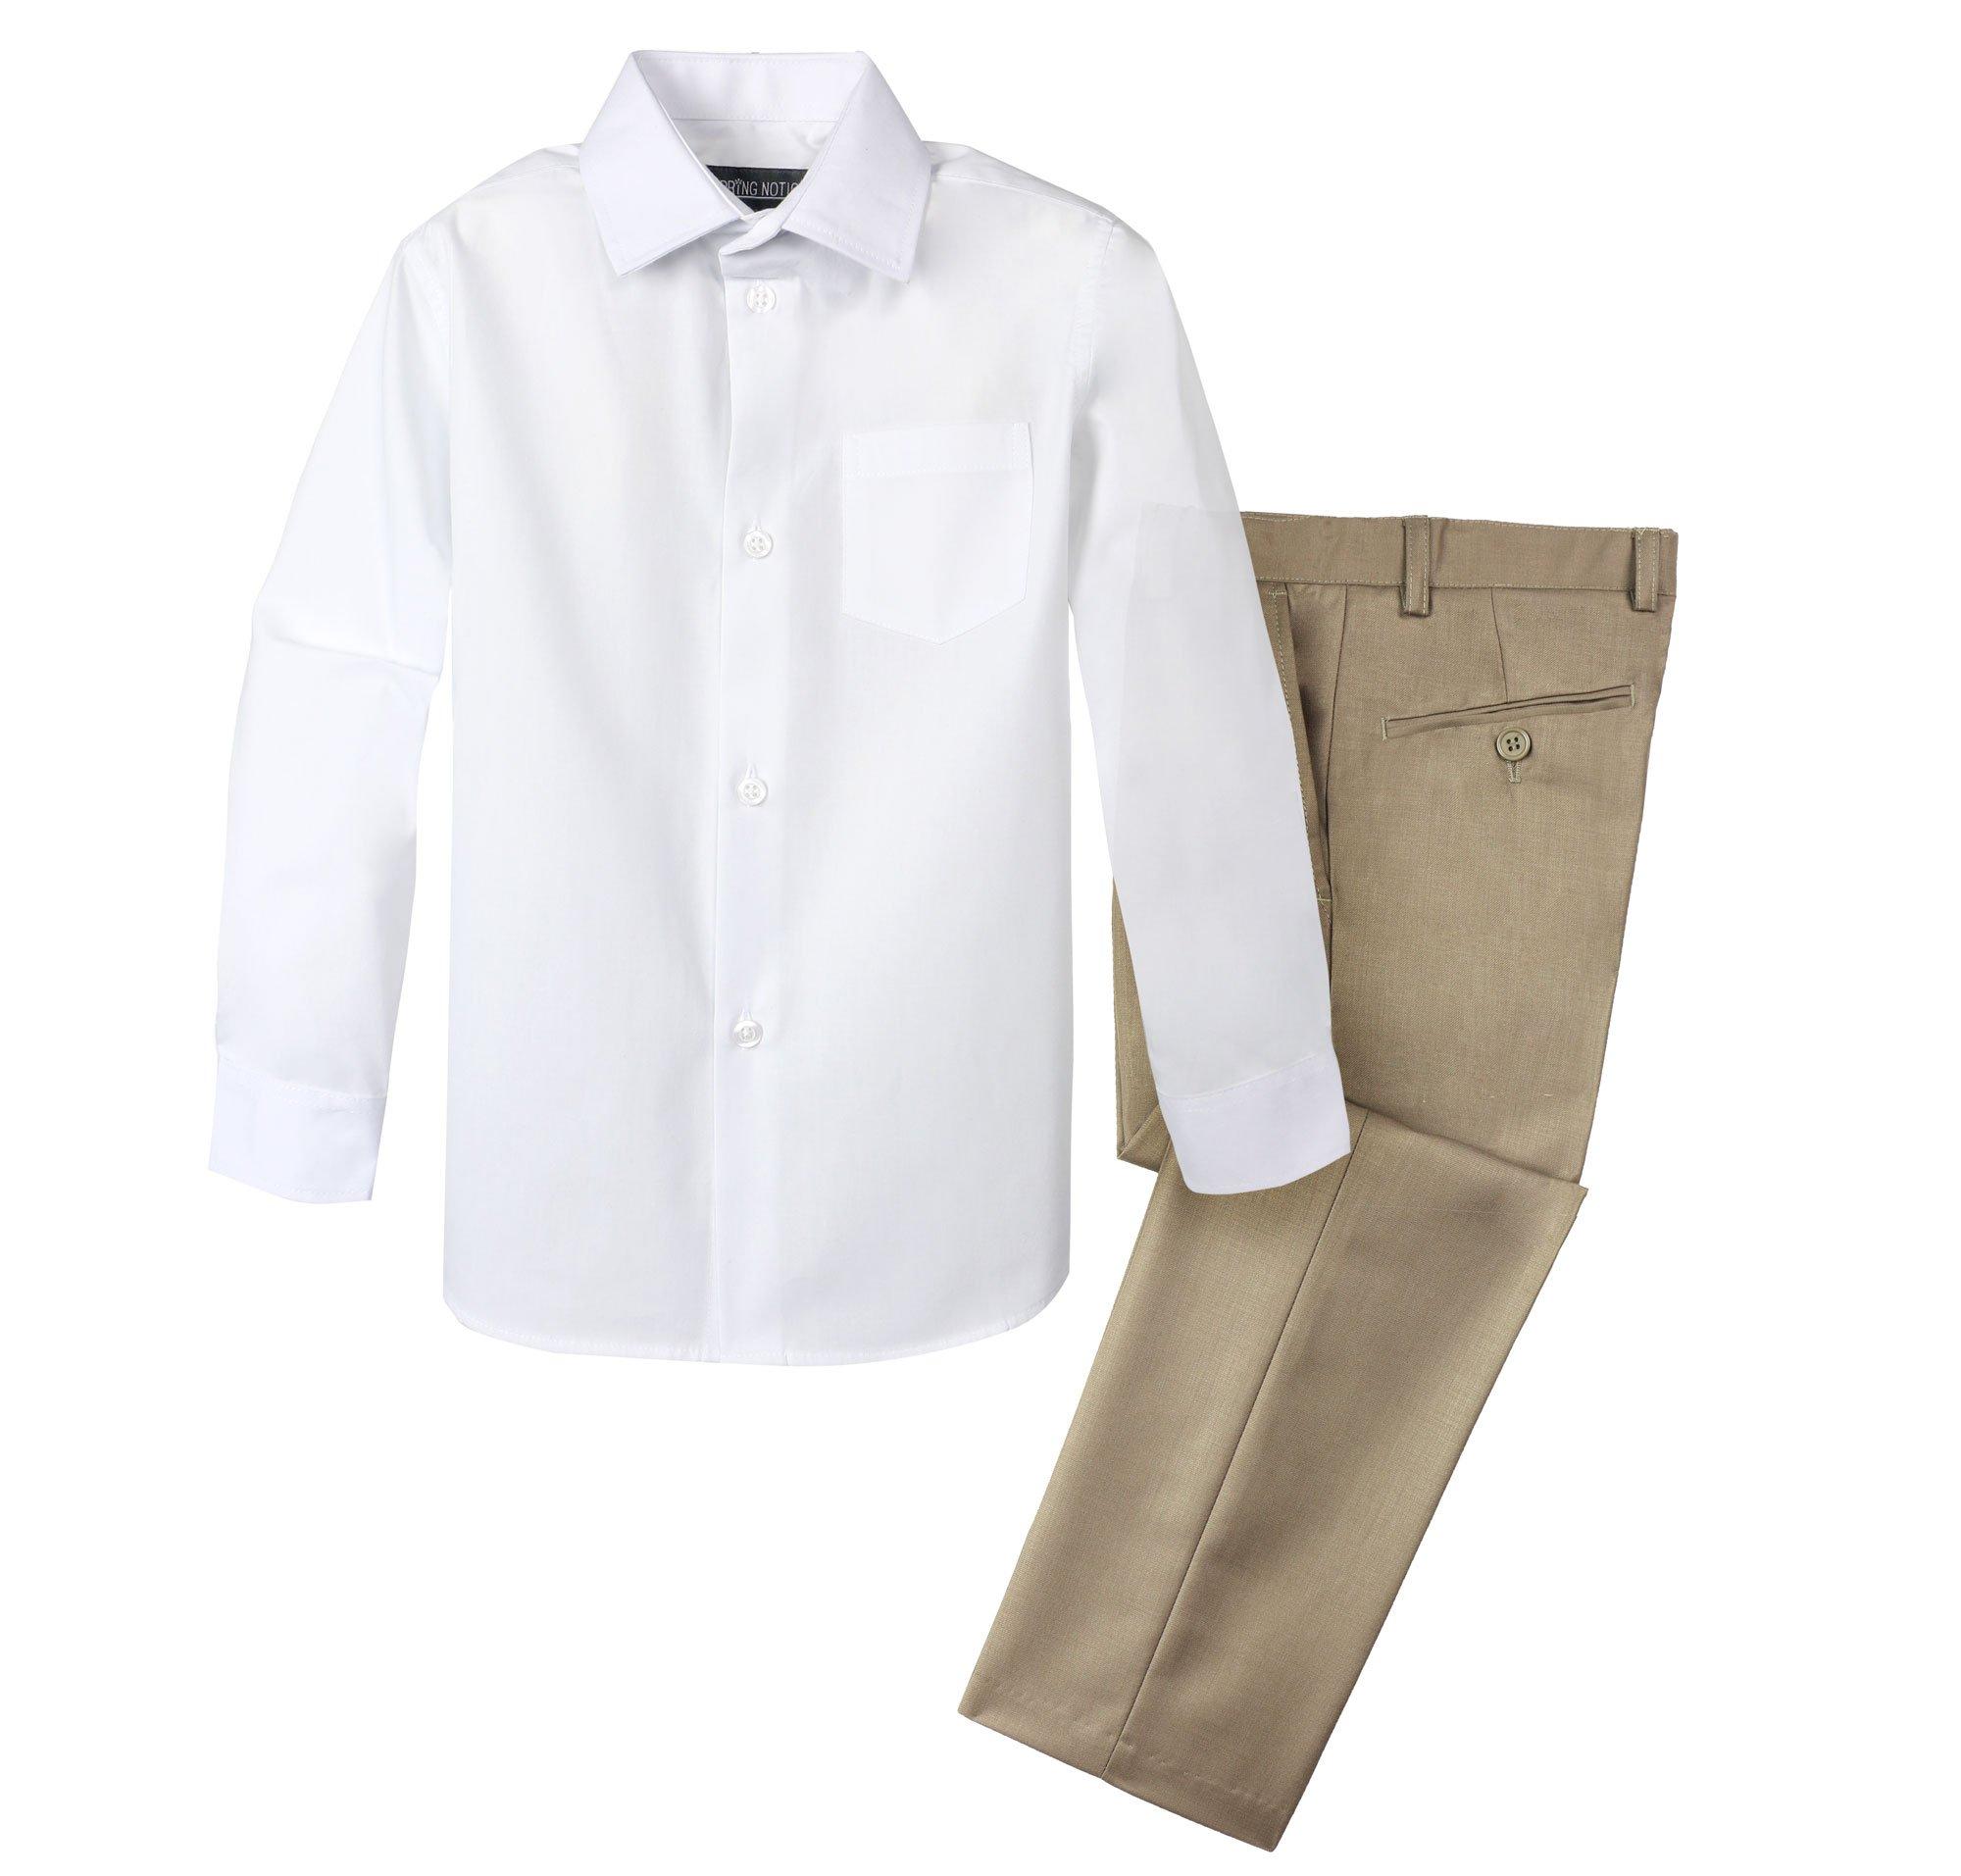 Spring Notion Boys' Dress Pants and Shirt 3T Tan/White